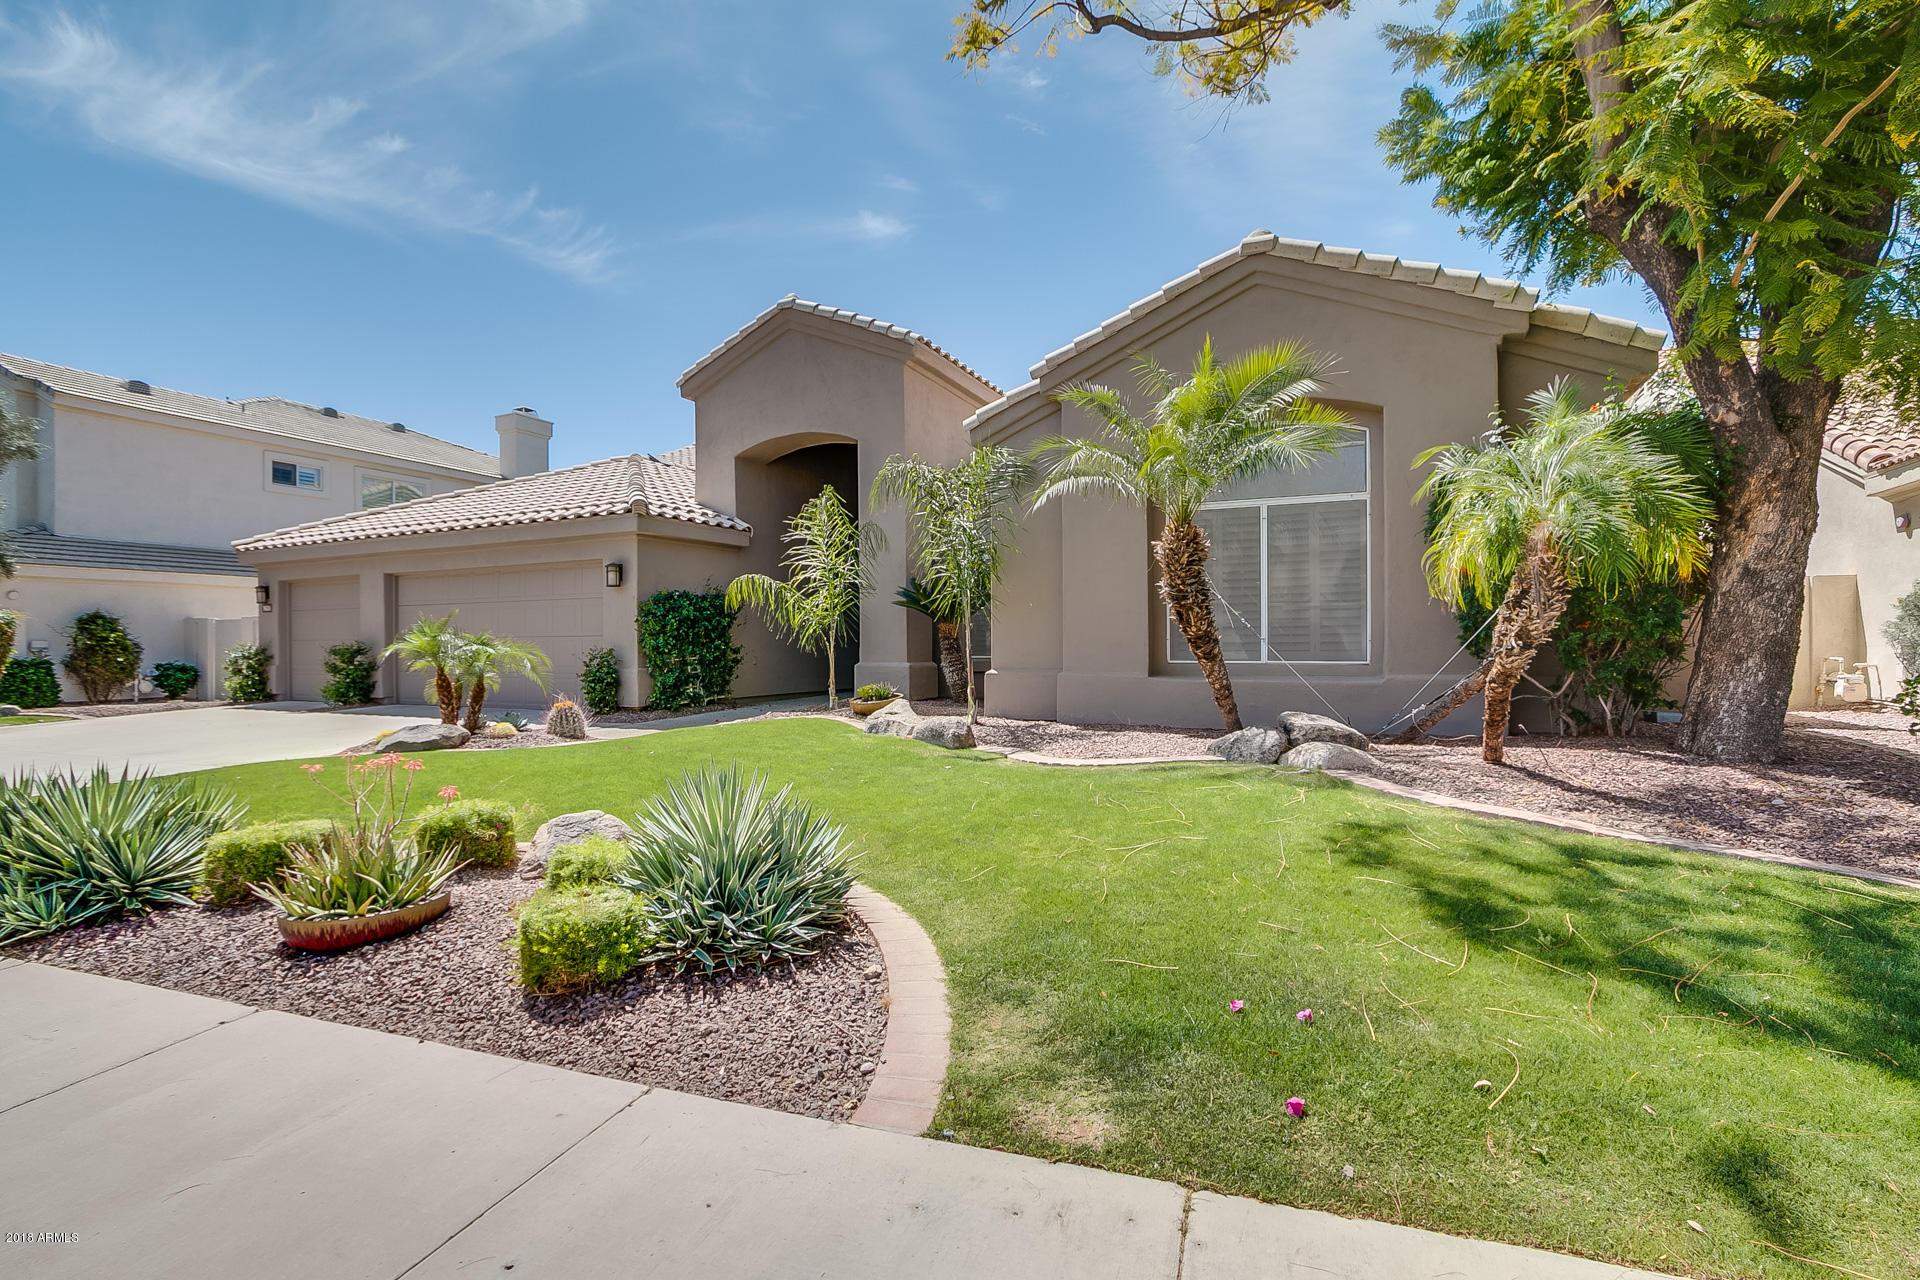 Photo of 9634 N 116TH Street, Scottsdale, AZ 85259